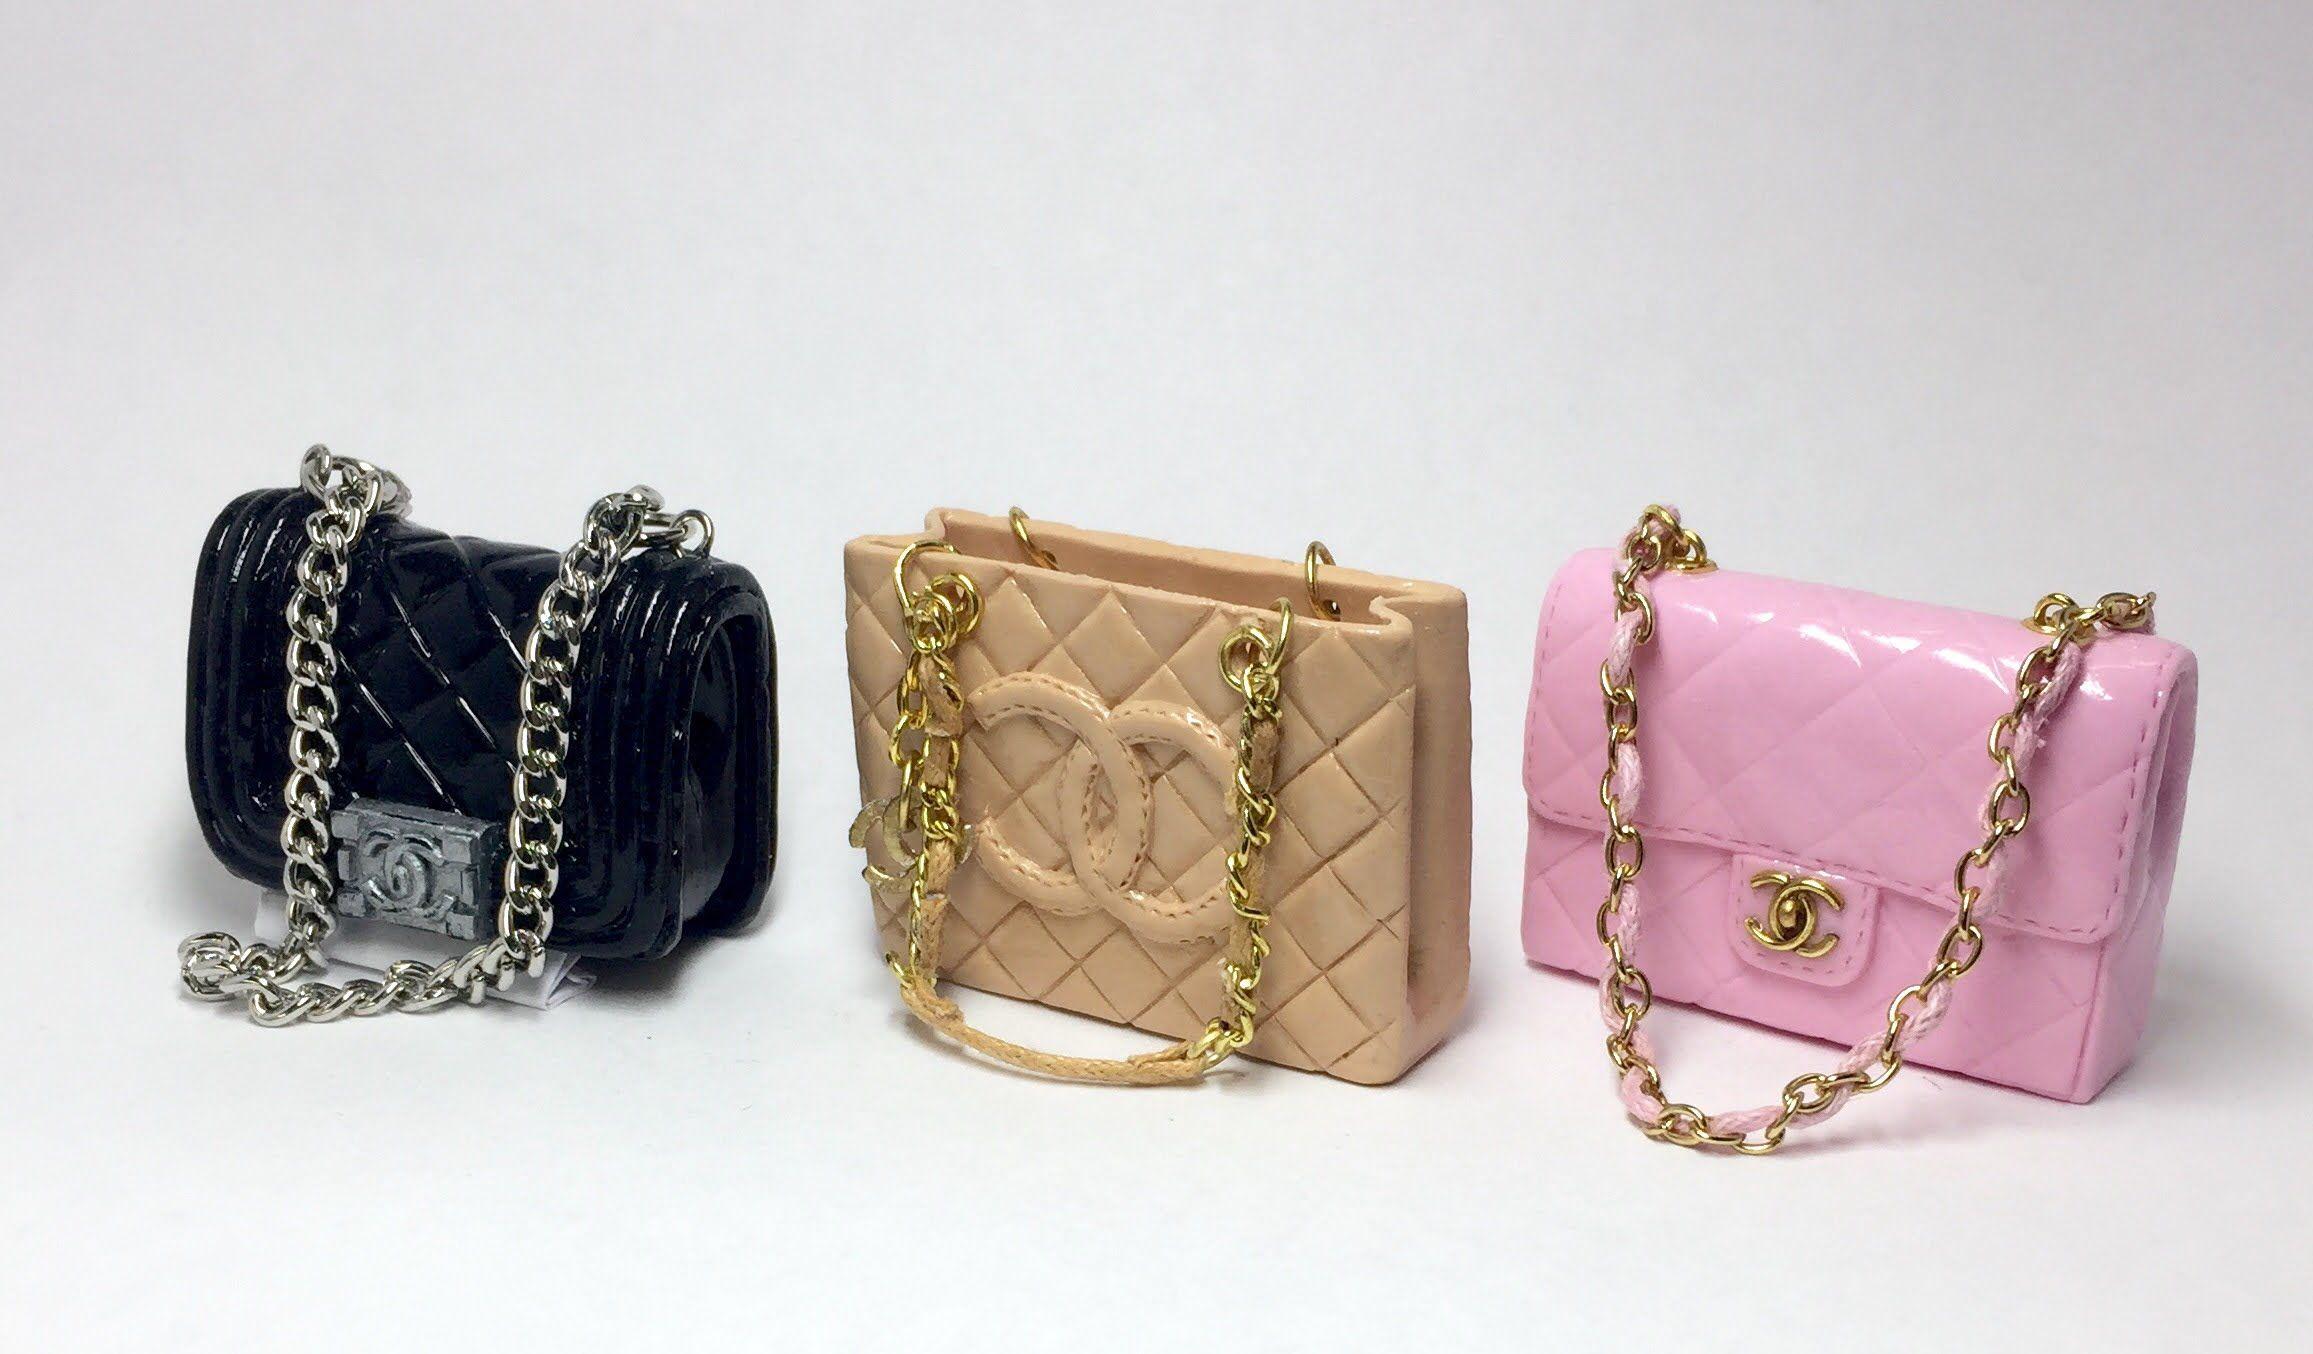 ff8caa5e2f5c96 Miniature Chanel Bag(Grand Shopping)/Polymer Clay Tutorial 폴리머클레이로 미니어쳐 .